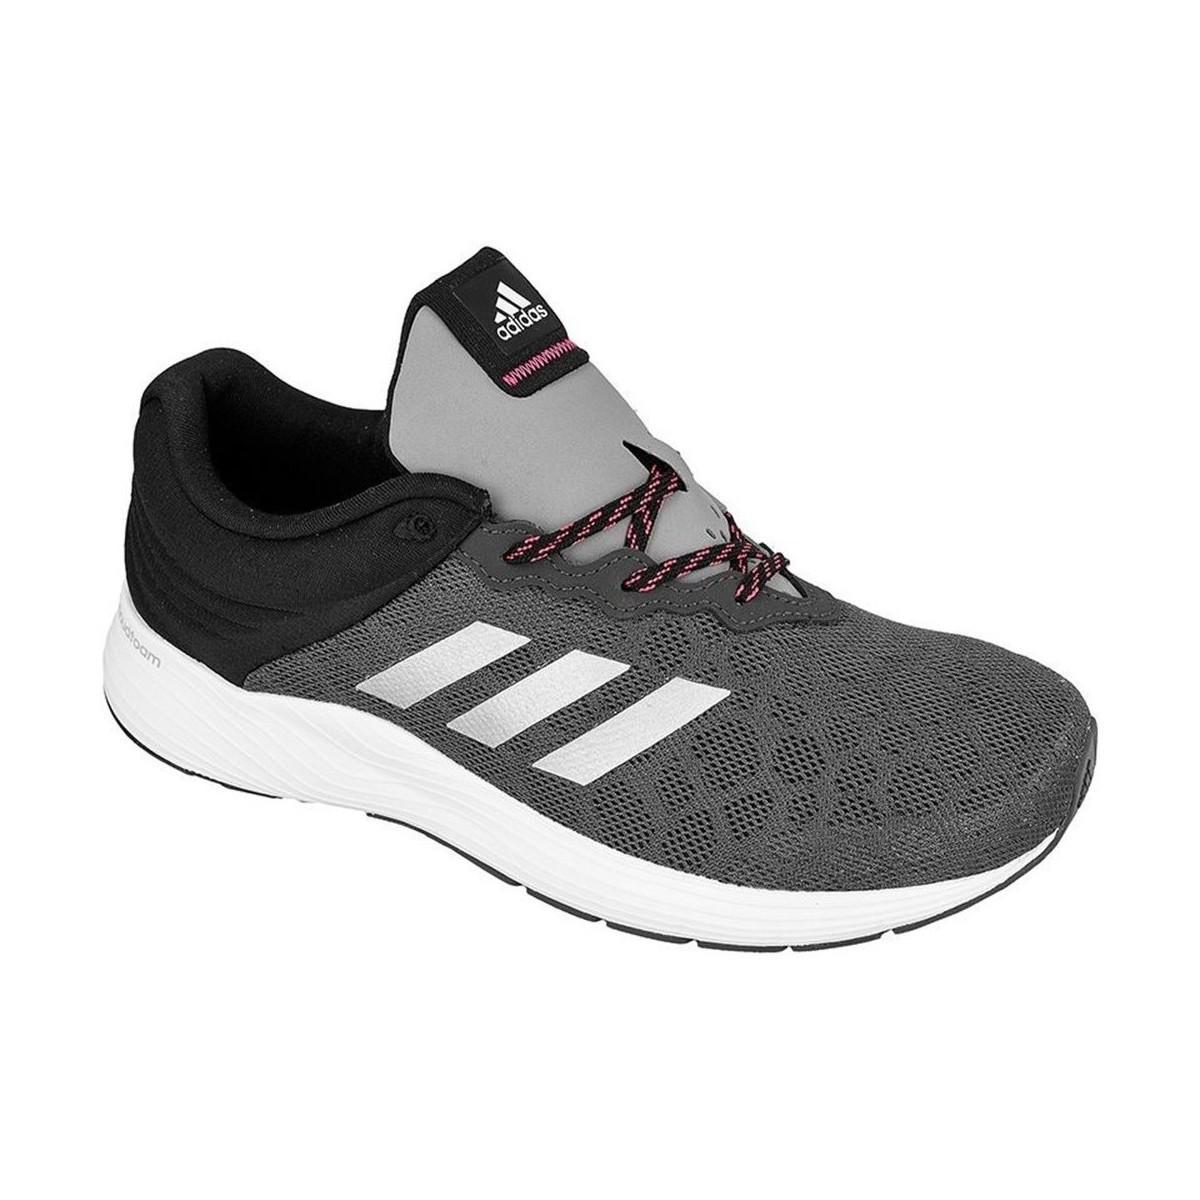 best sneakers 988d0 277f8 adidas Fluid Cloud W Womens Running Trainers In Black in Bla